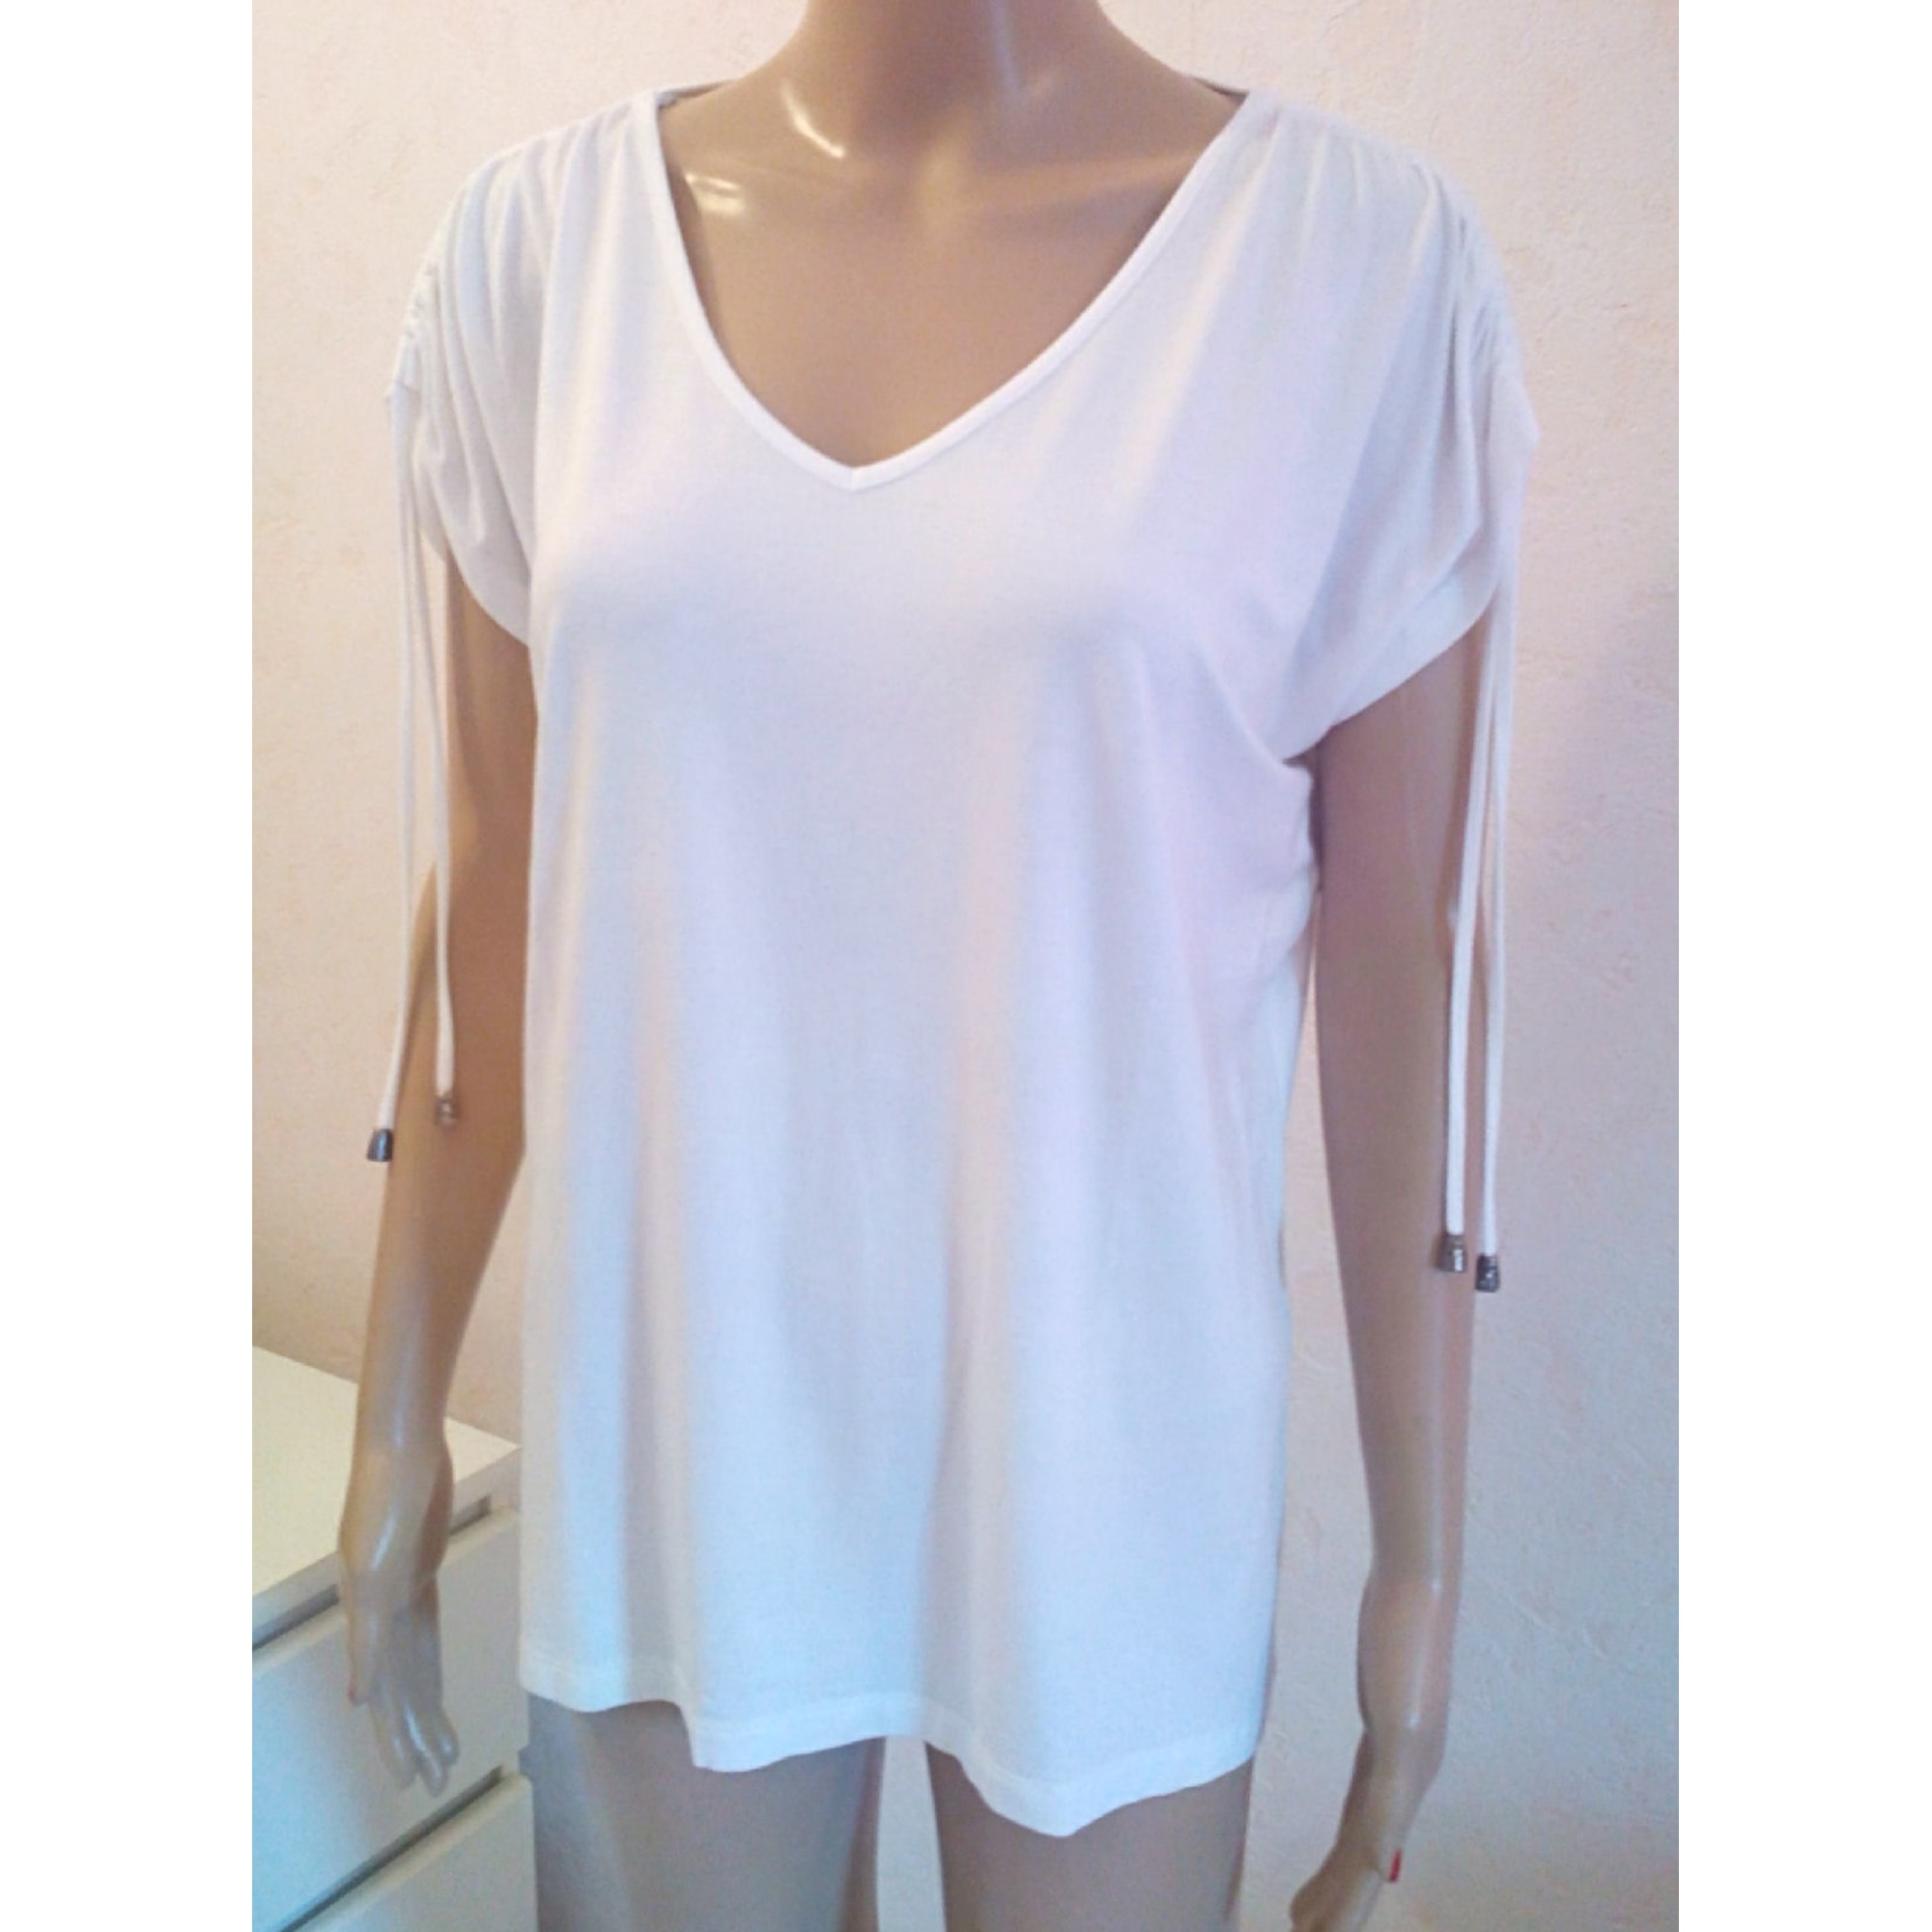 Top, tee-shirt UN JOUR AILLEURS Blanc, blanc cassé, écru